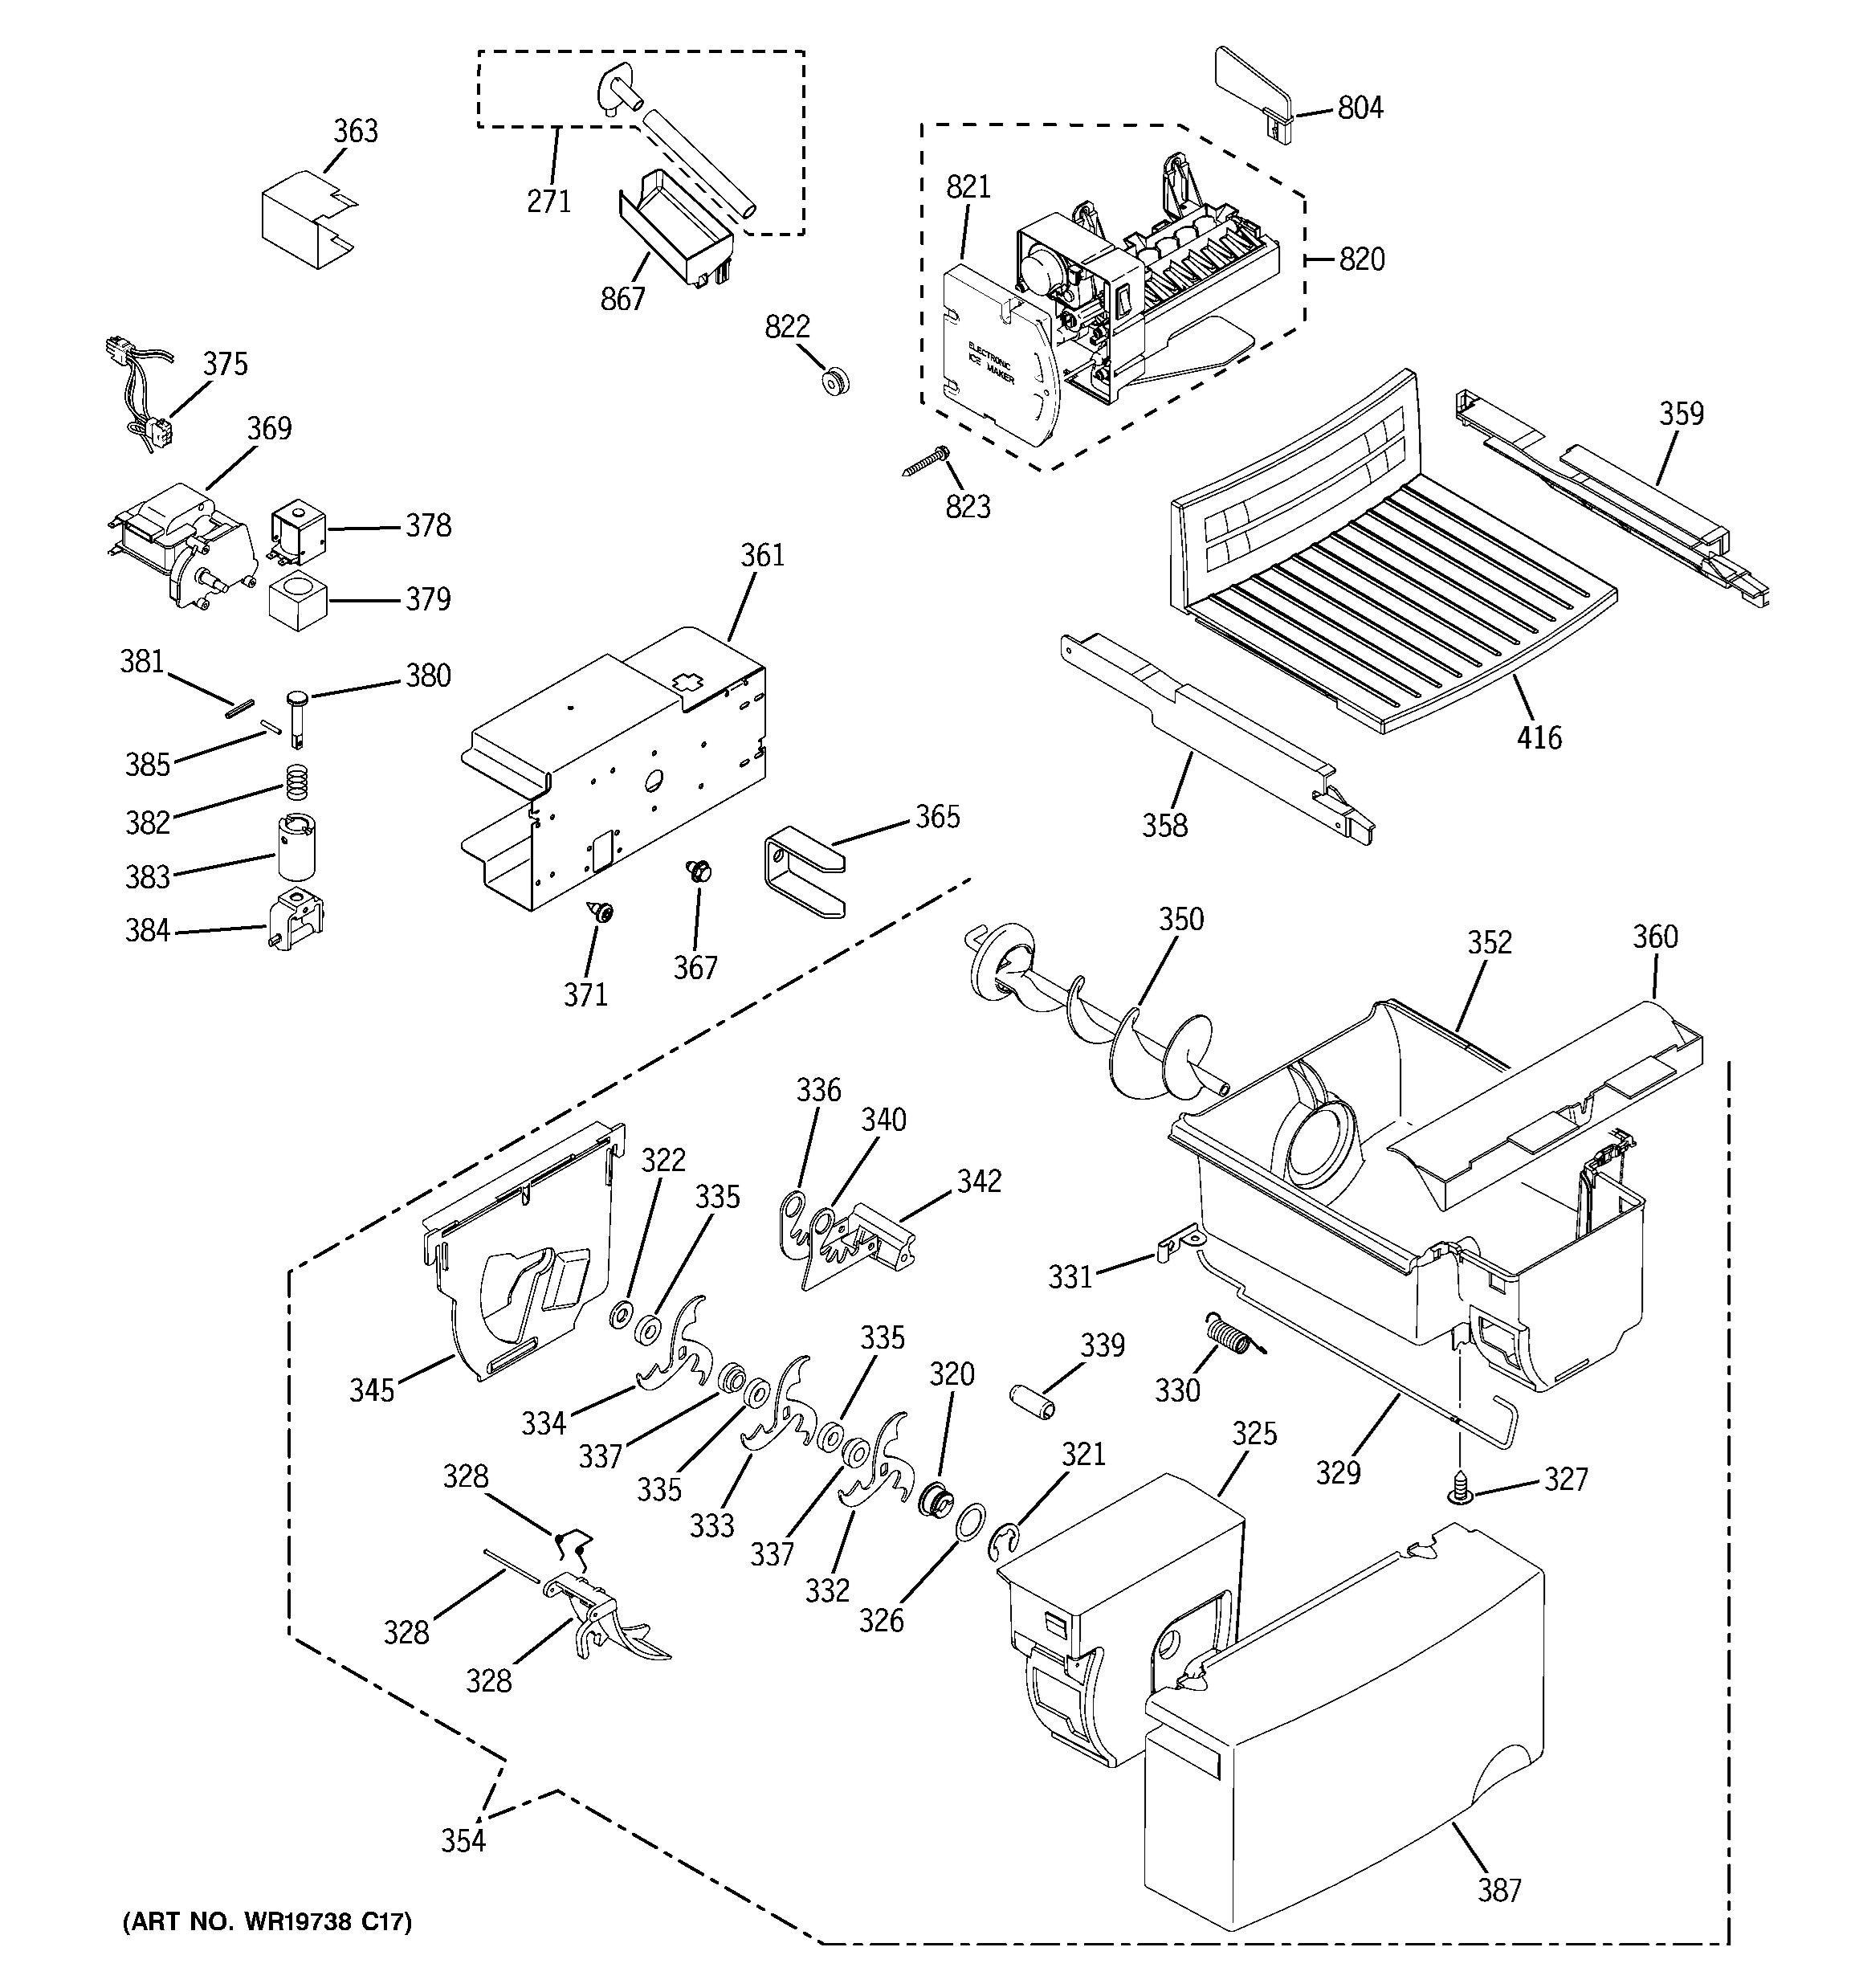 GeneralElectricImg_00136600_00136658.i05?width=1000 electric blower motor wiring diagram,Electric Standing Fan Motor Wiring Diagram